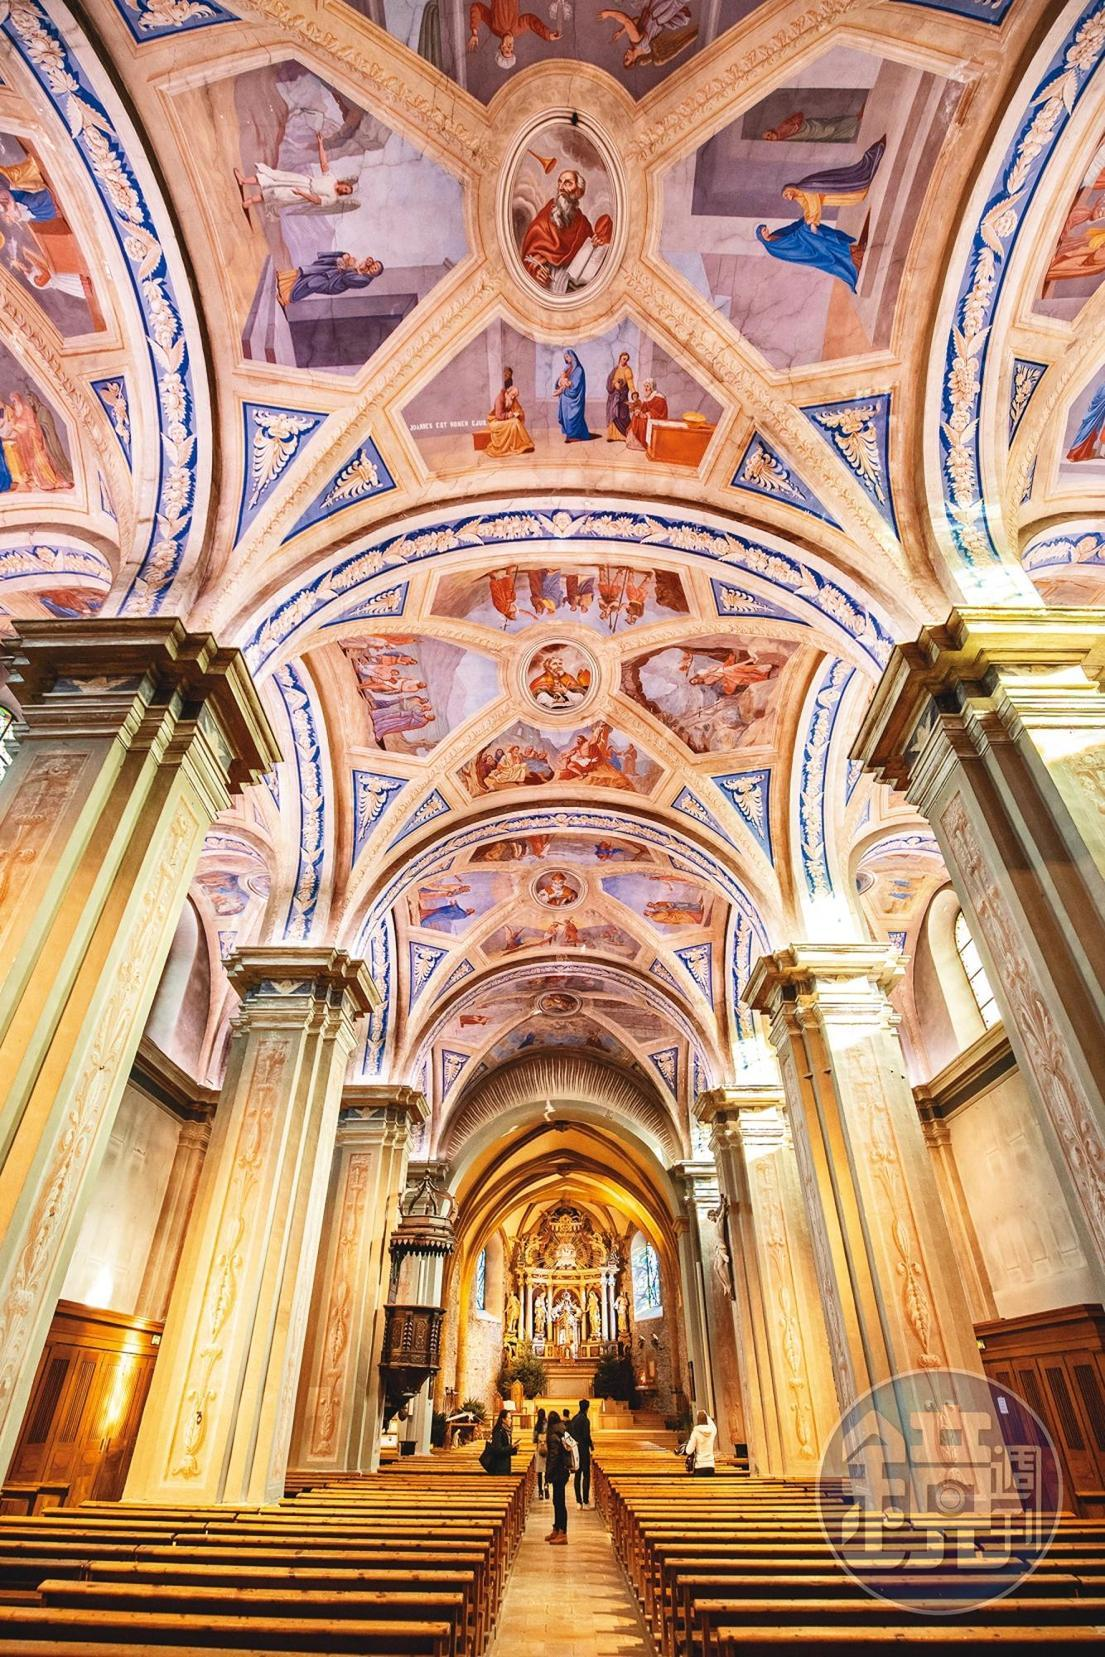 「Saint Jean Baptiste教堂」上方以彩繪述說聖經故事。